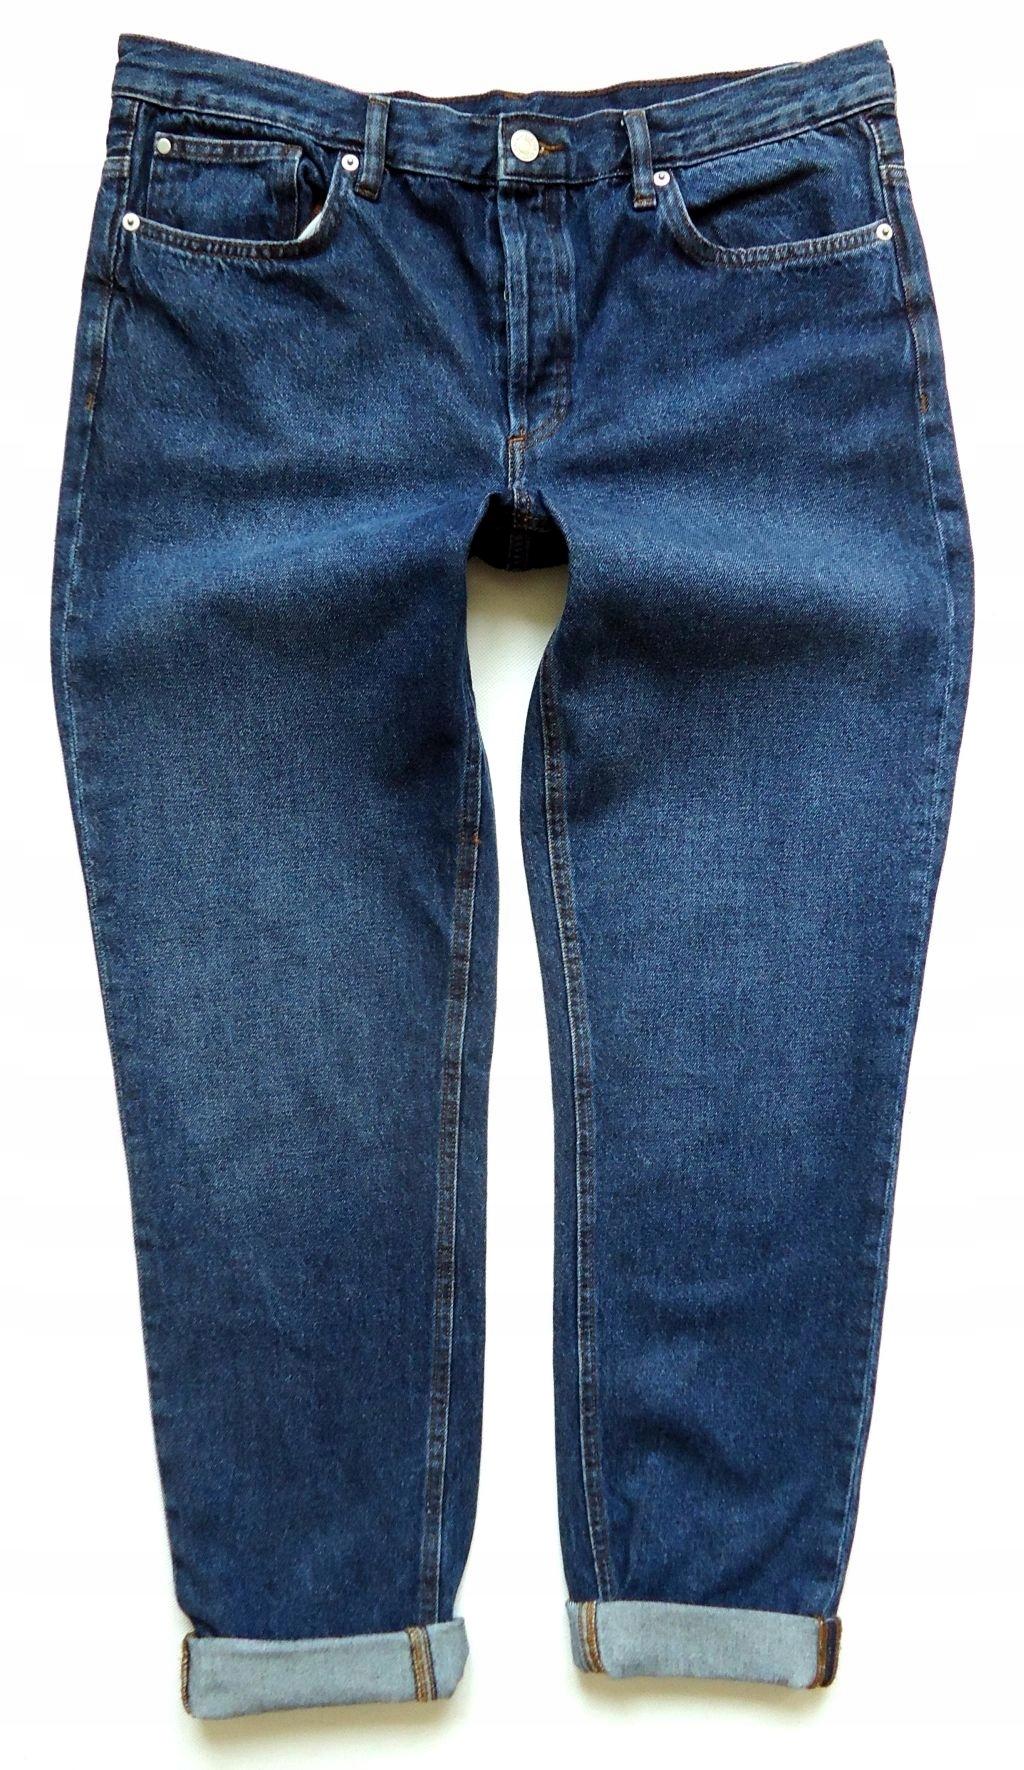 e030d02f17e2 H M spodnie jeansy rurki UNISEX 44 - 7521943119 - oficjalne archiwum ...